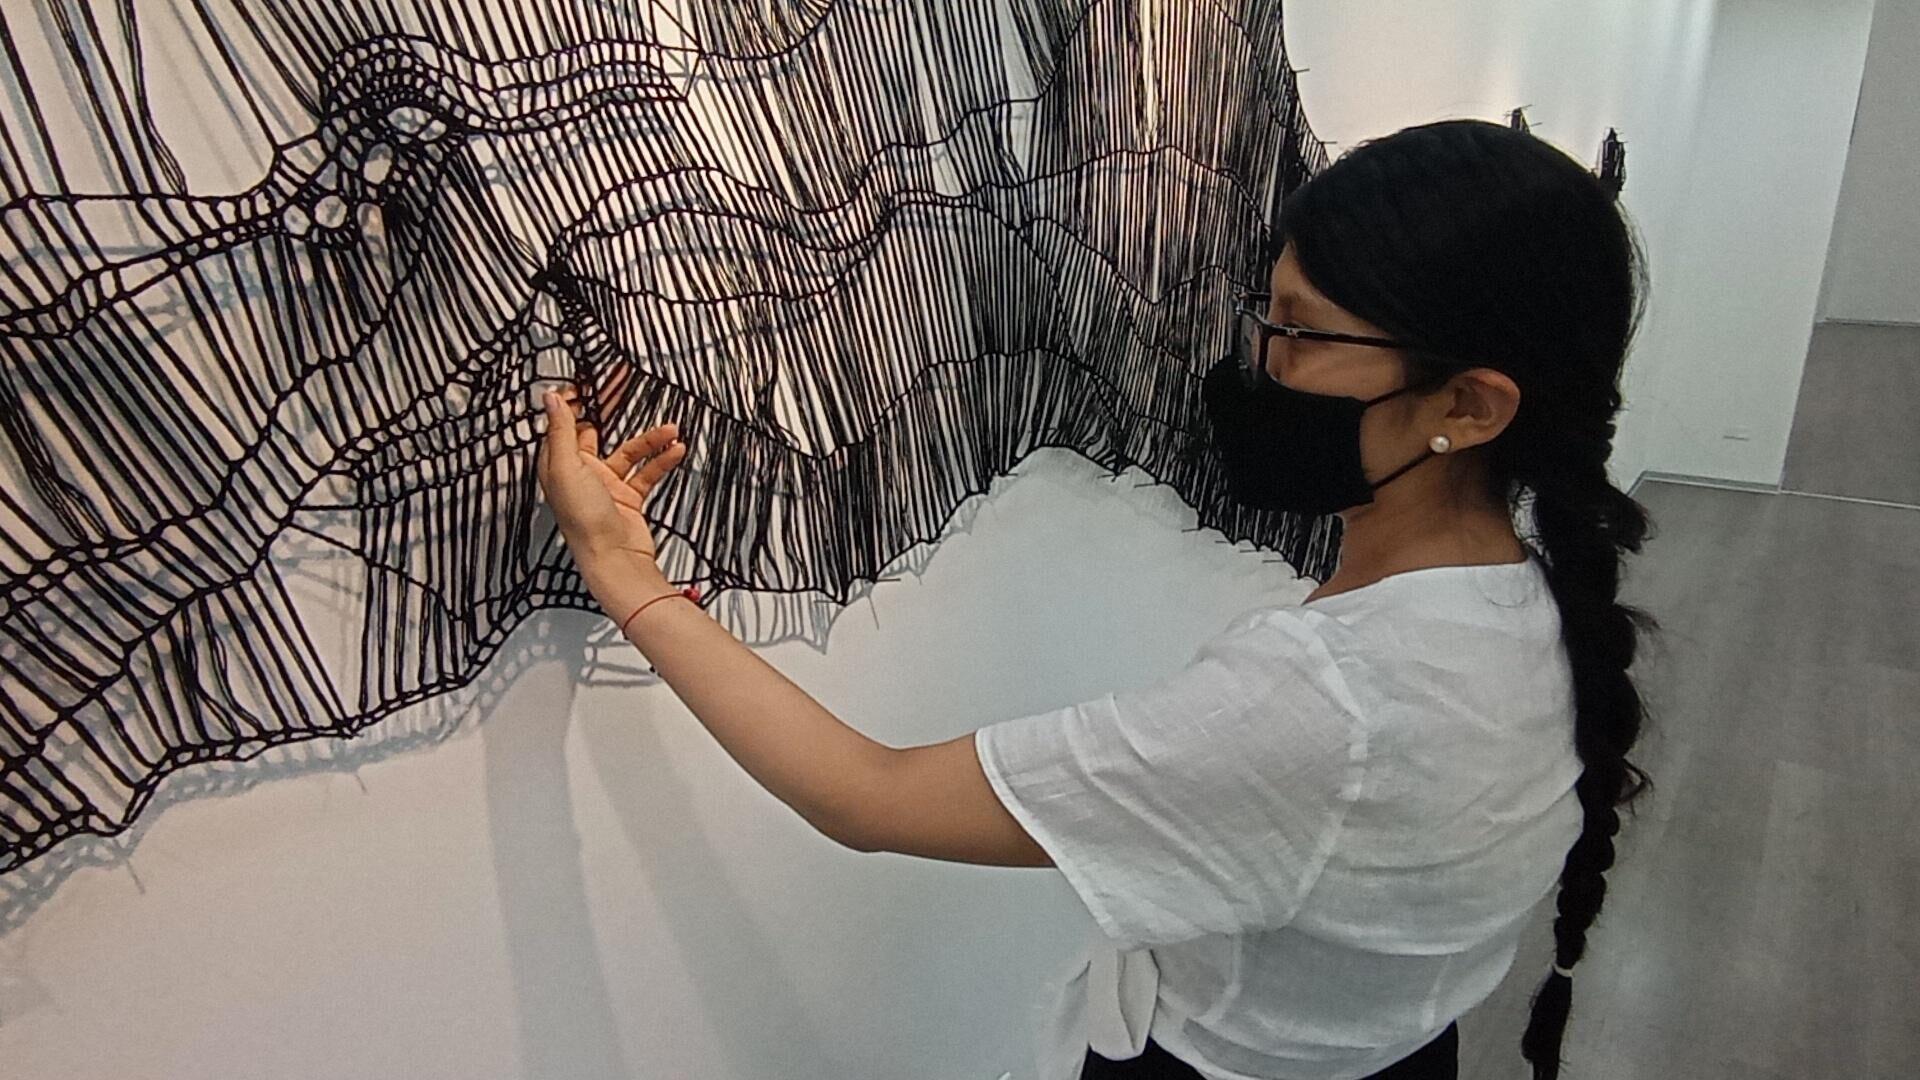 La artista limeña Cristina Flores con su obra - Sputnik Mundo, 1920, 16.04.2021